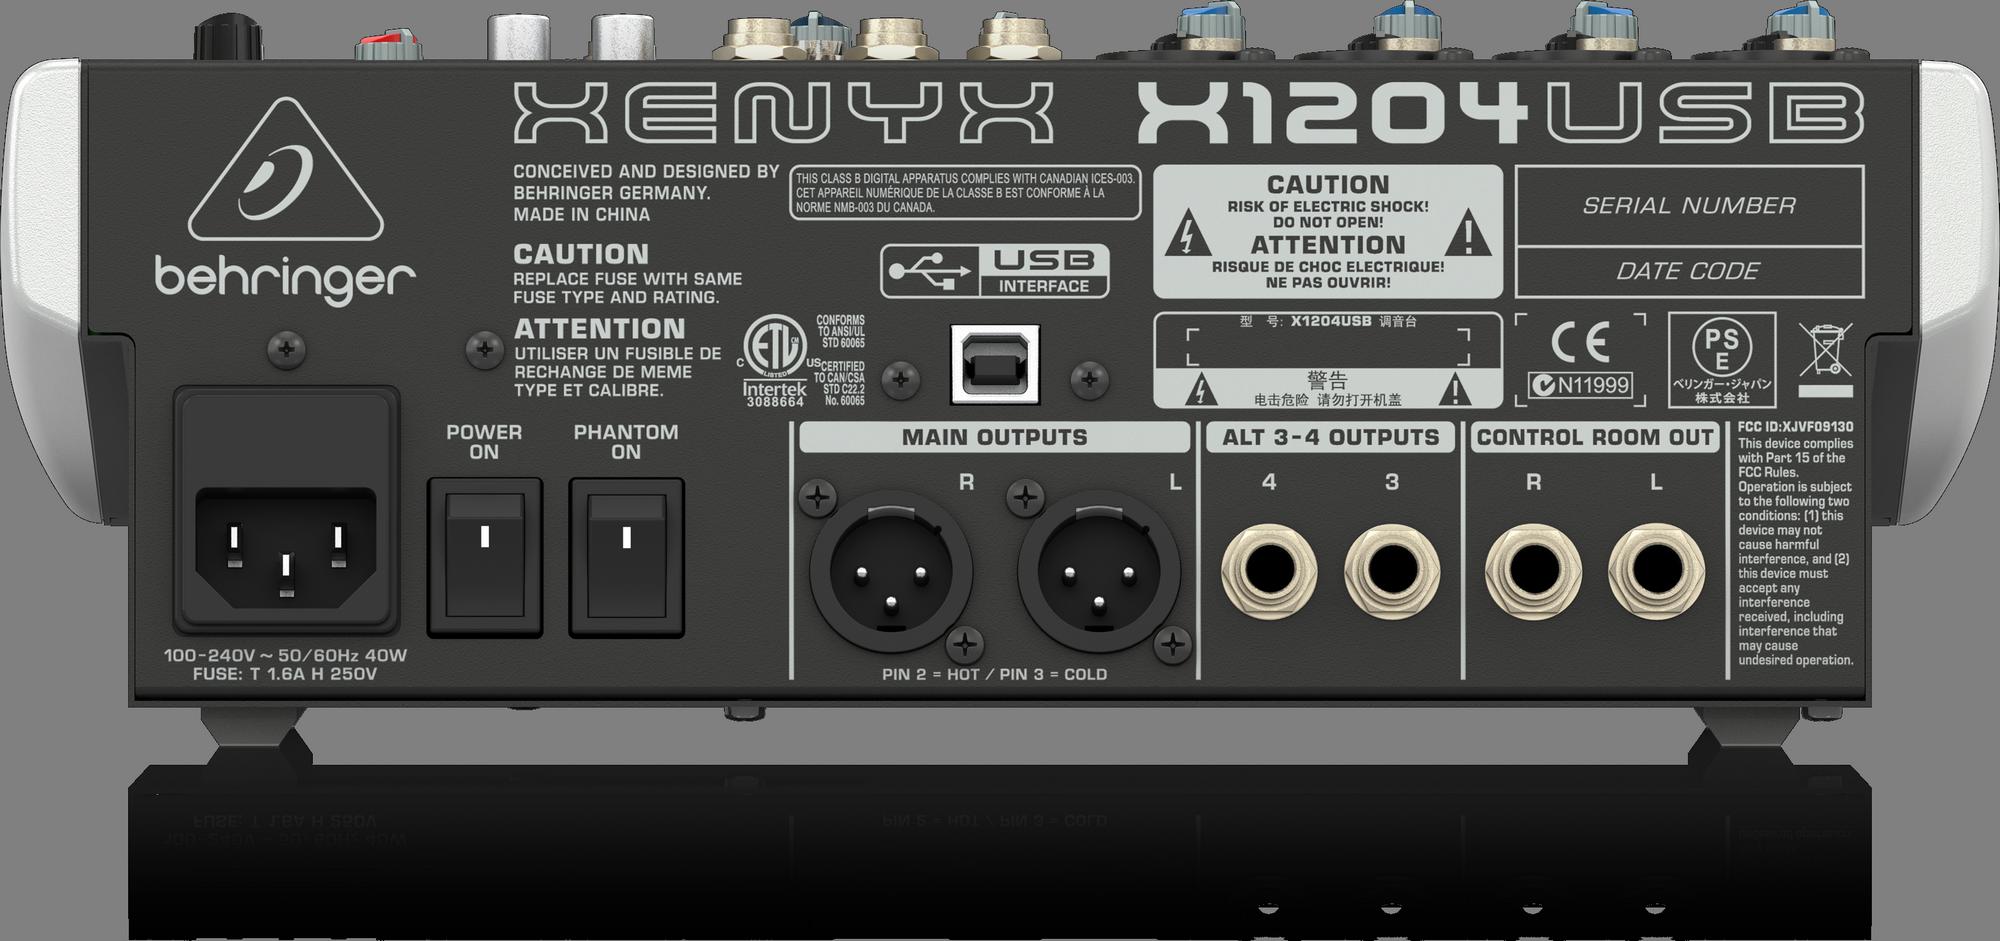 Behringer Xenyx X1204 USB Table mixage analogique